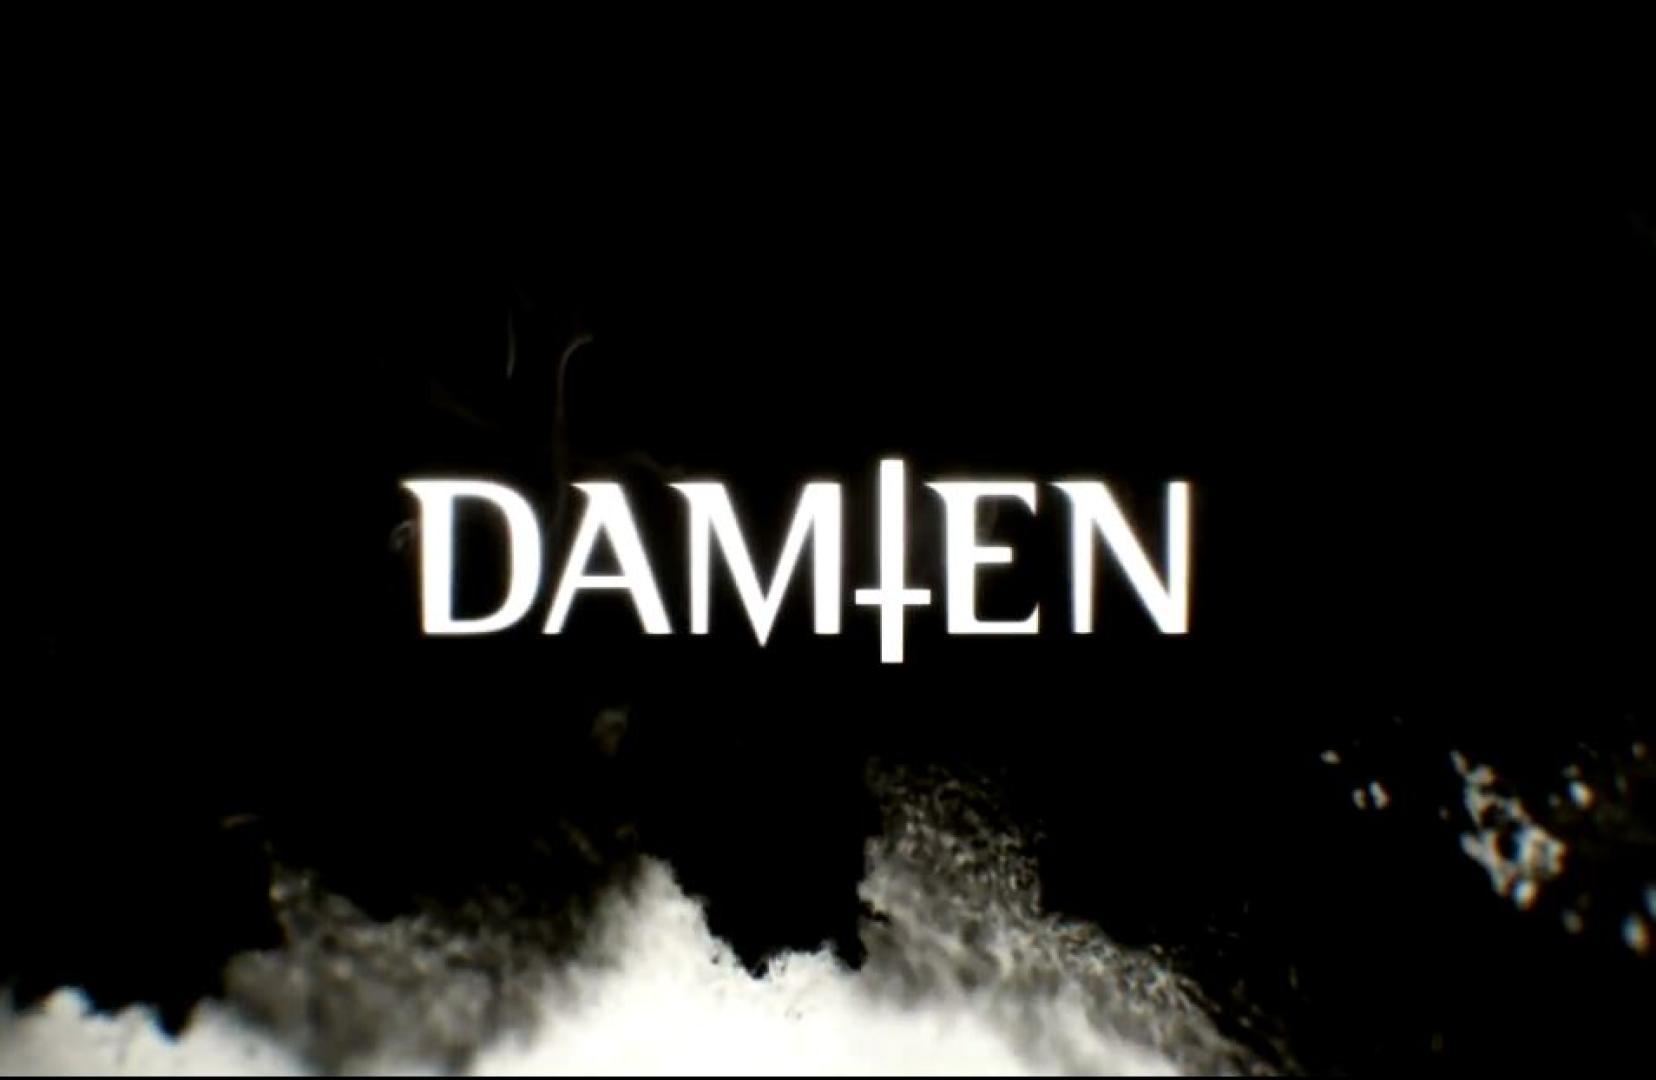 Damien 1x02